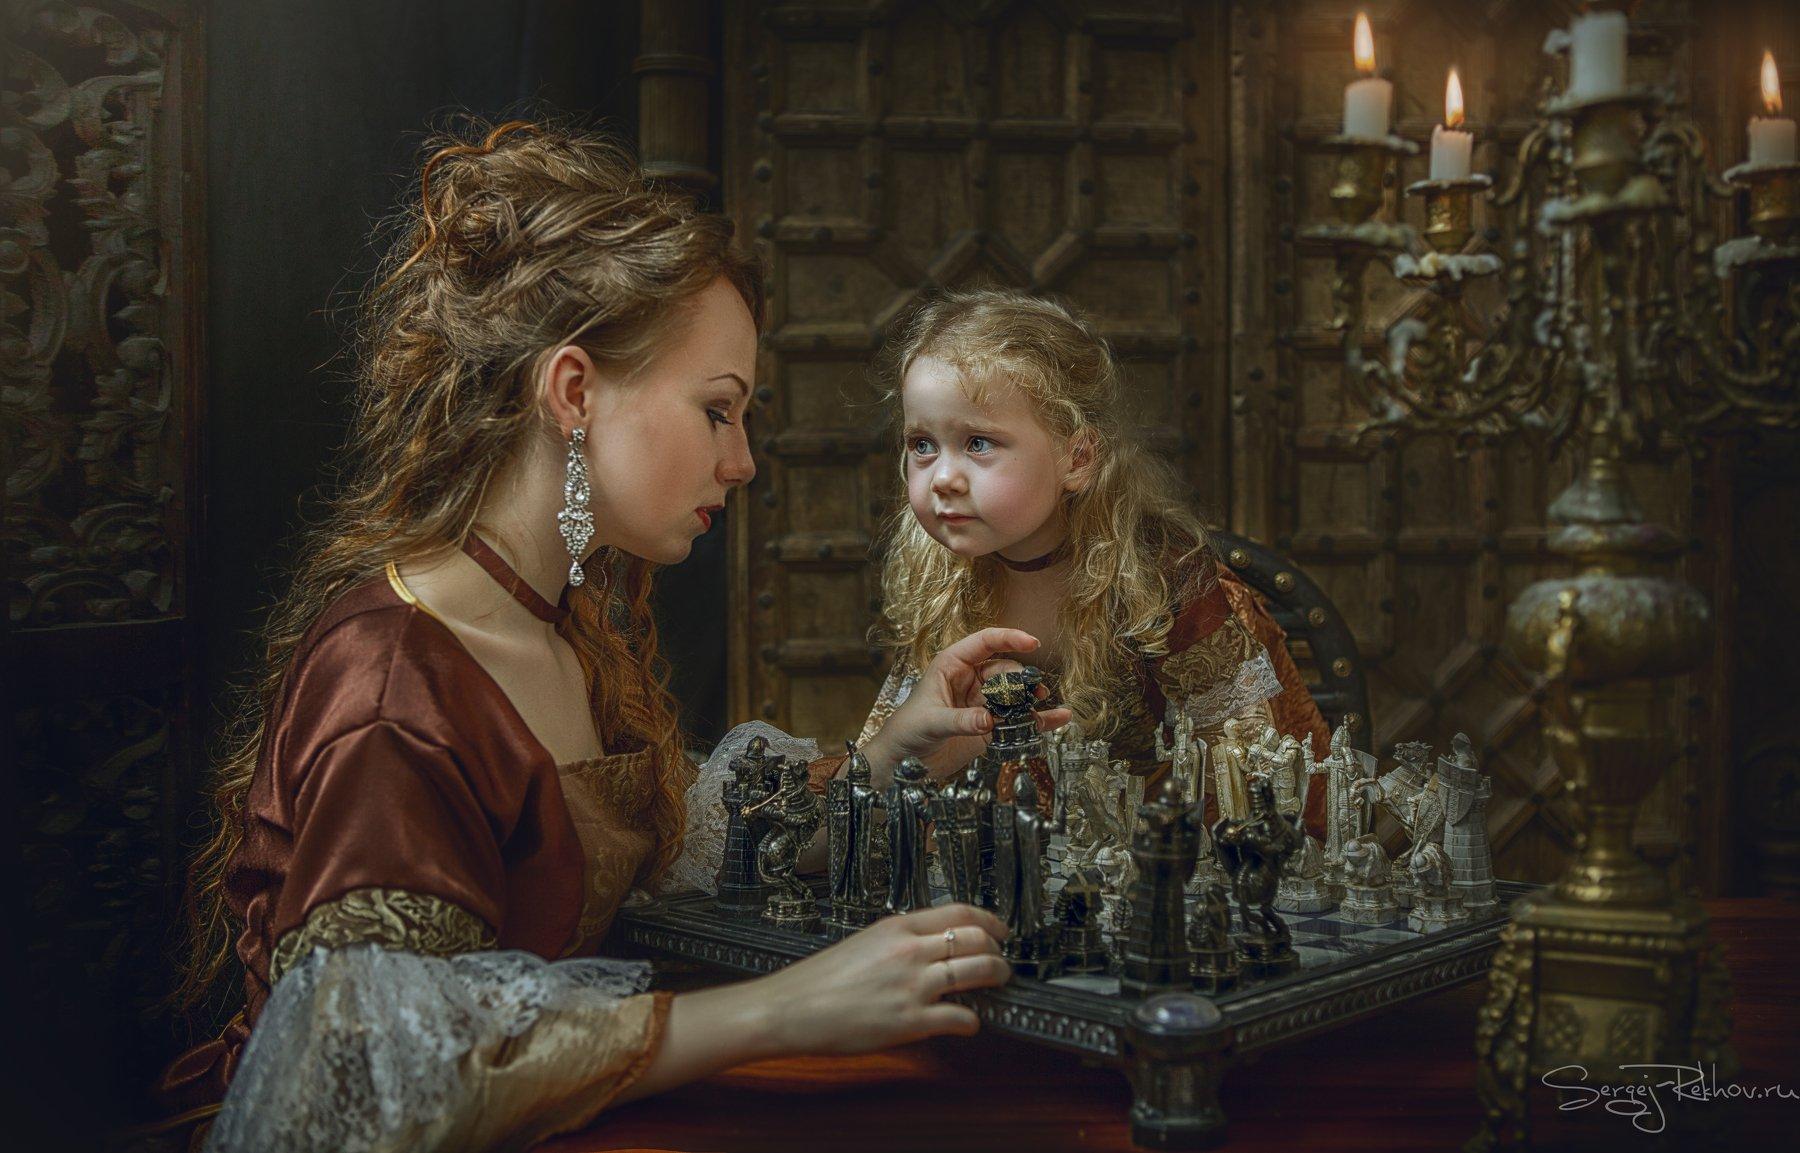 мама, ребёнок, девочка, студия, шахматы, рехов, сергейрехов, sergejrekhov, rekhov, Сергей Рехов